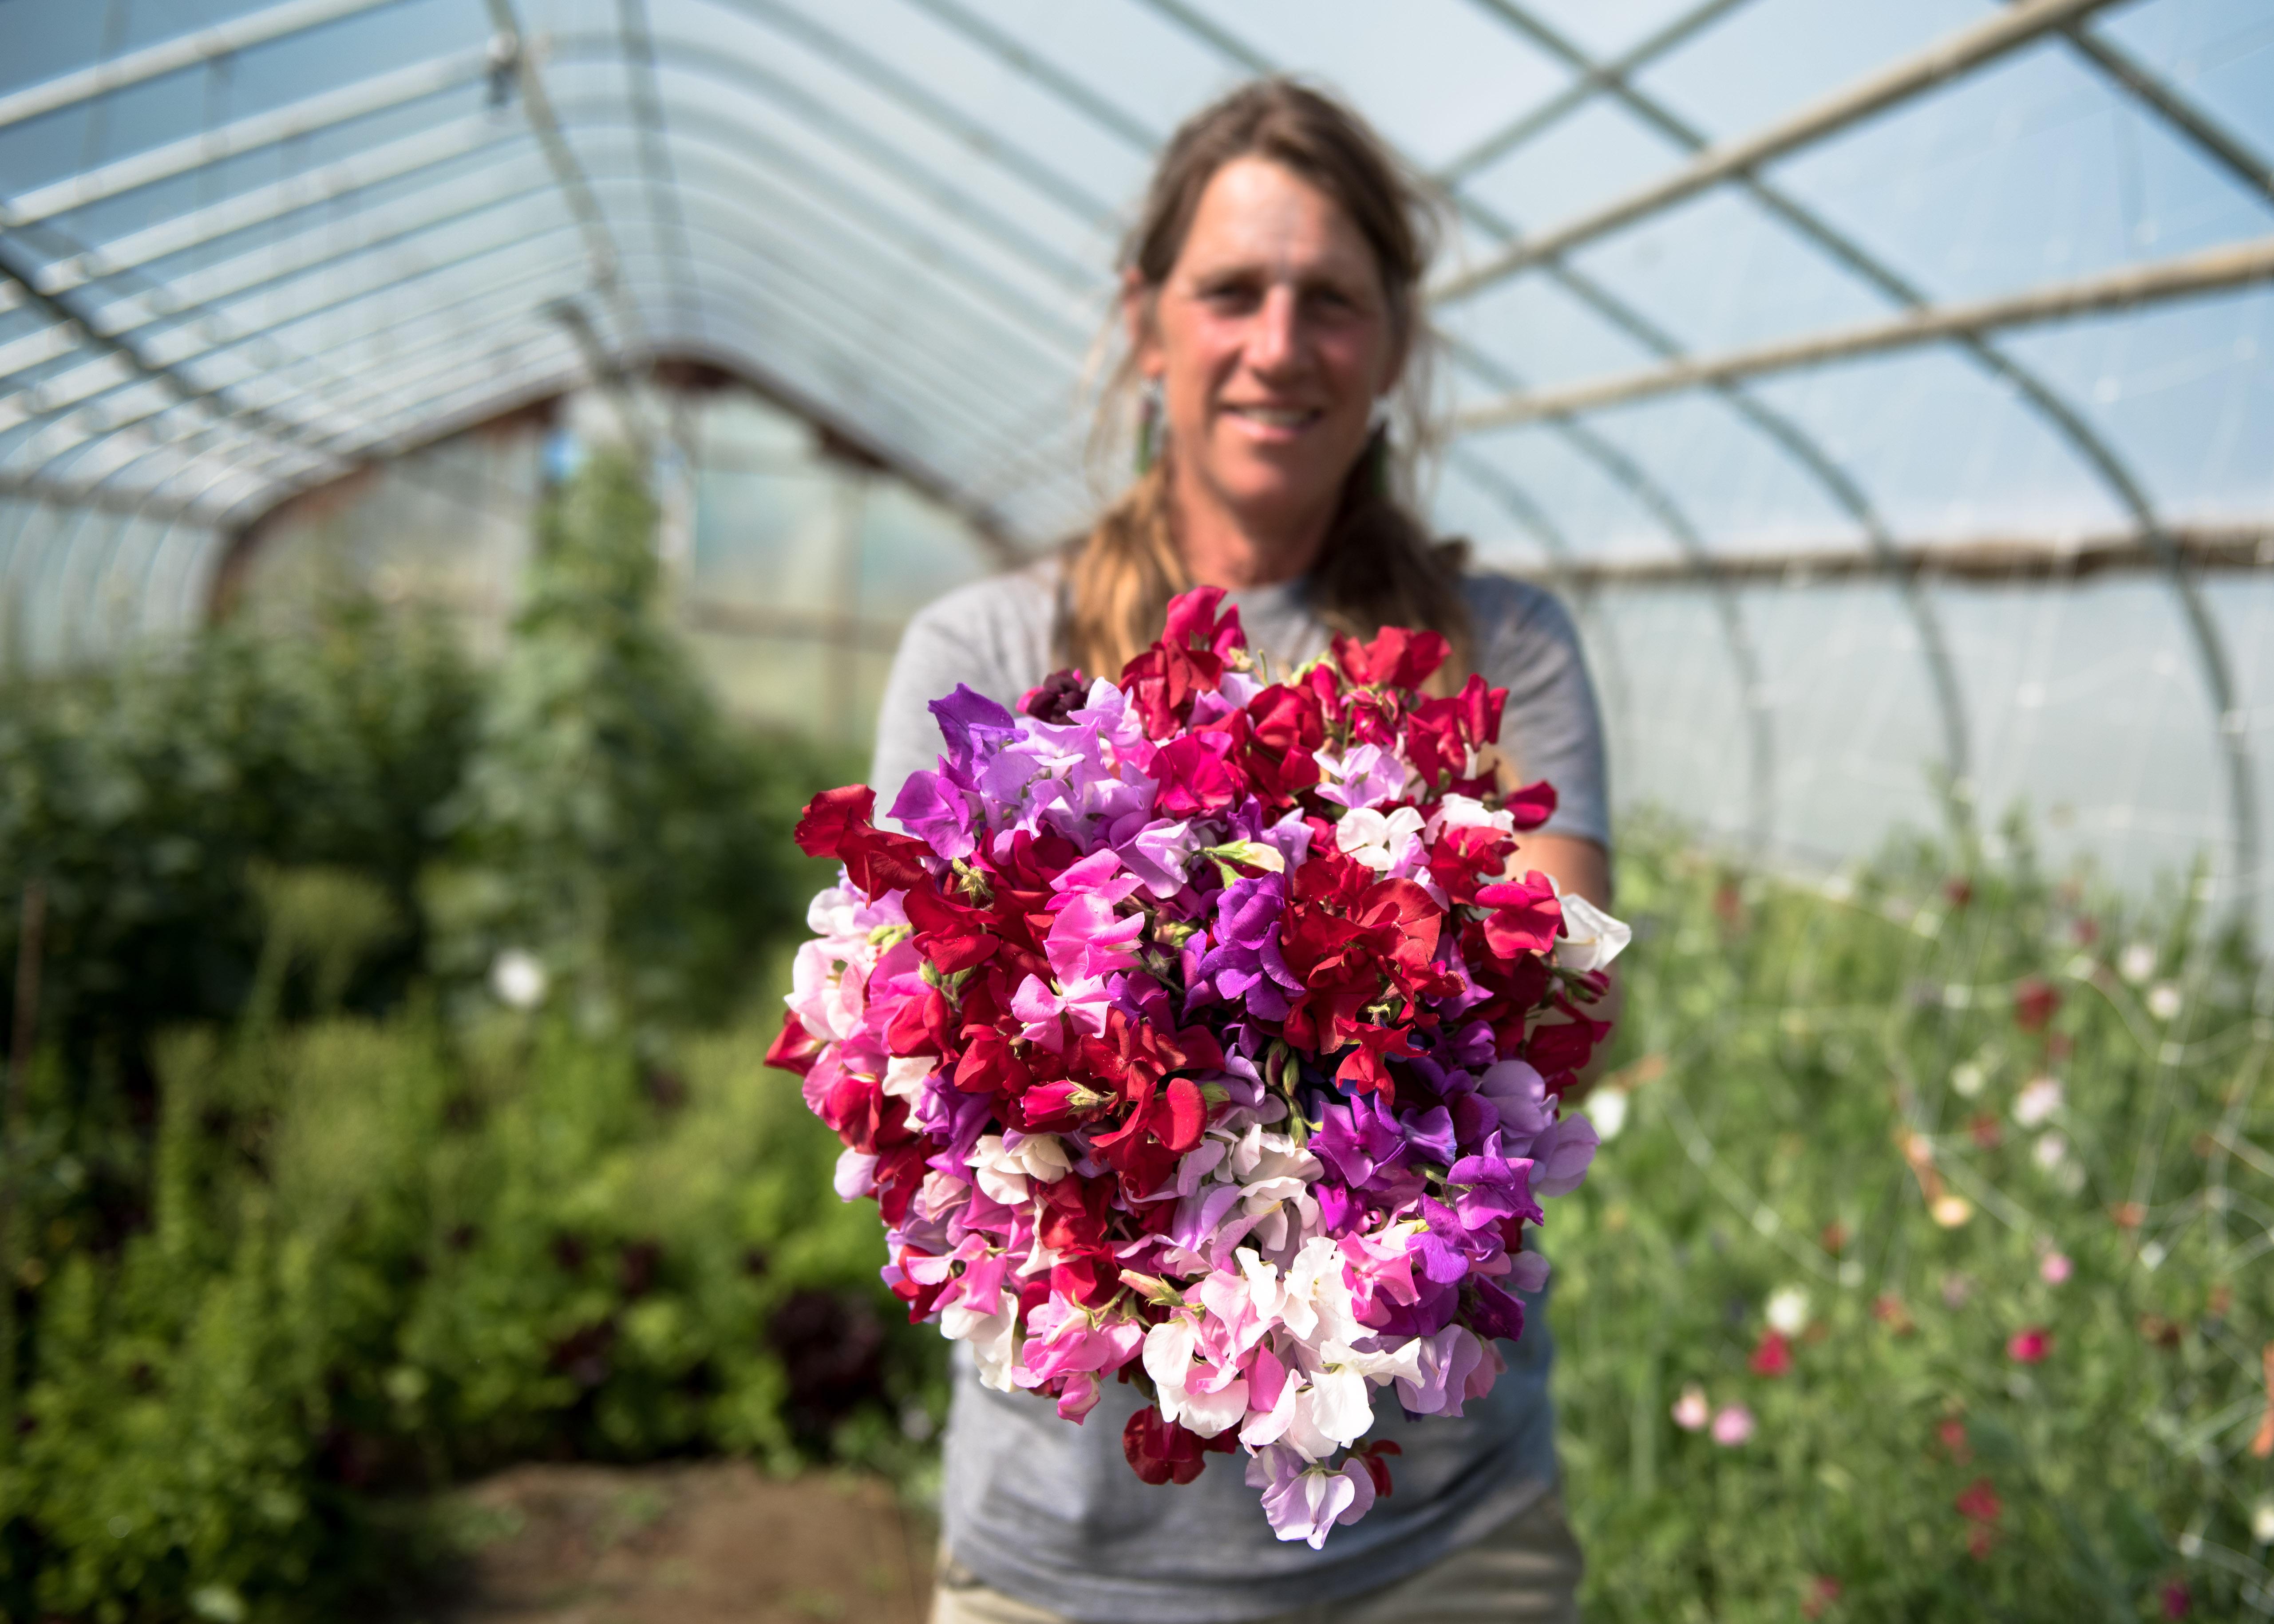 Jan Goranson harvesting flowers